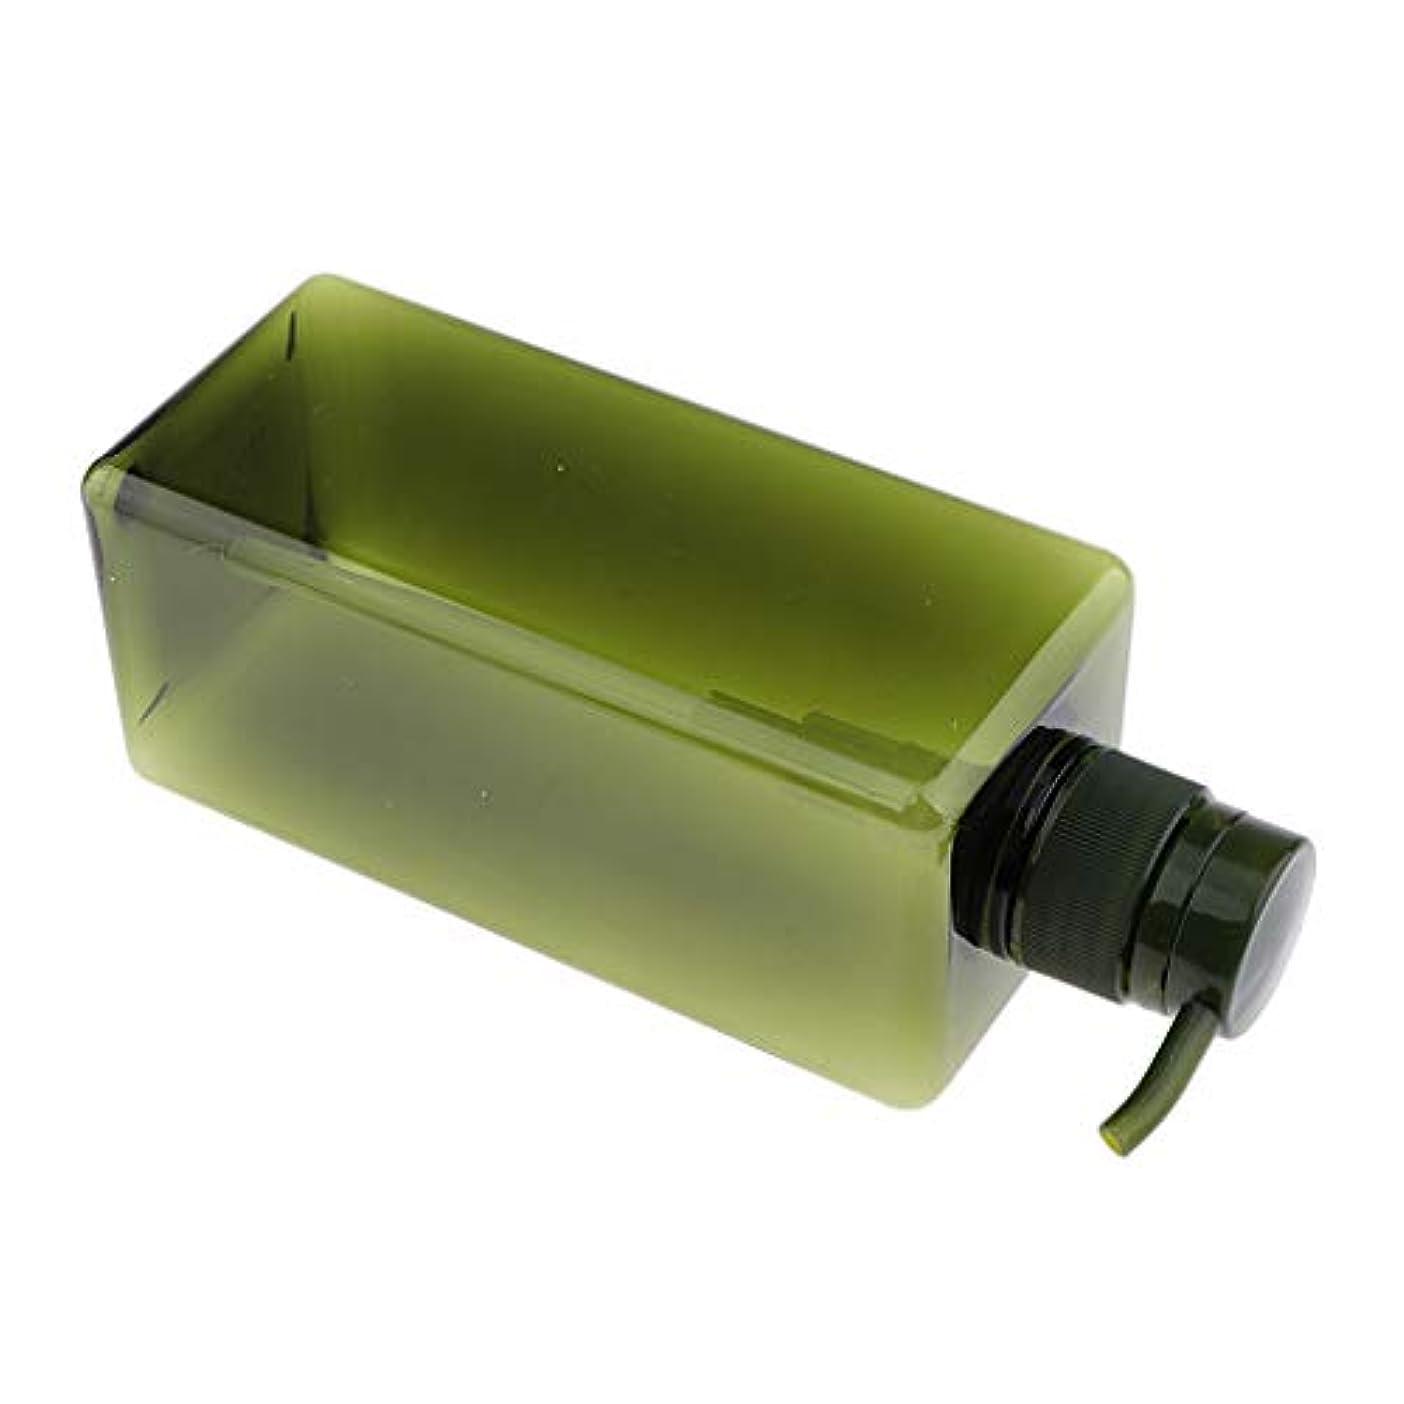 B Baosity ソープディスペンサー ローションボトル シャンプーコンテナ 650ml 高品質 プラスチック 4色選べ - グリーン